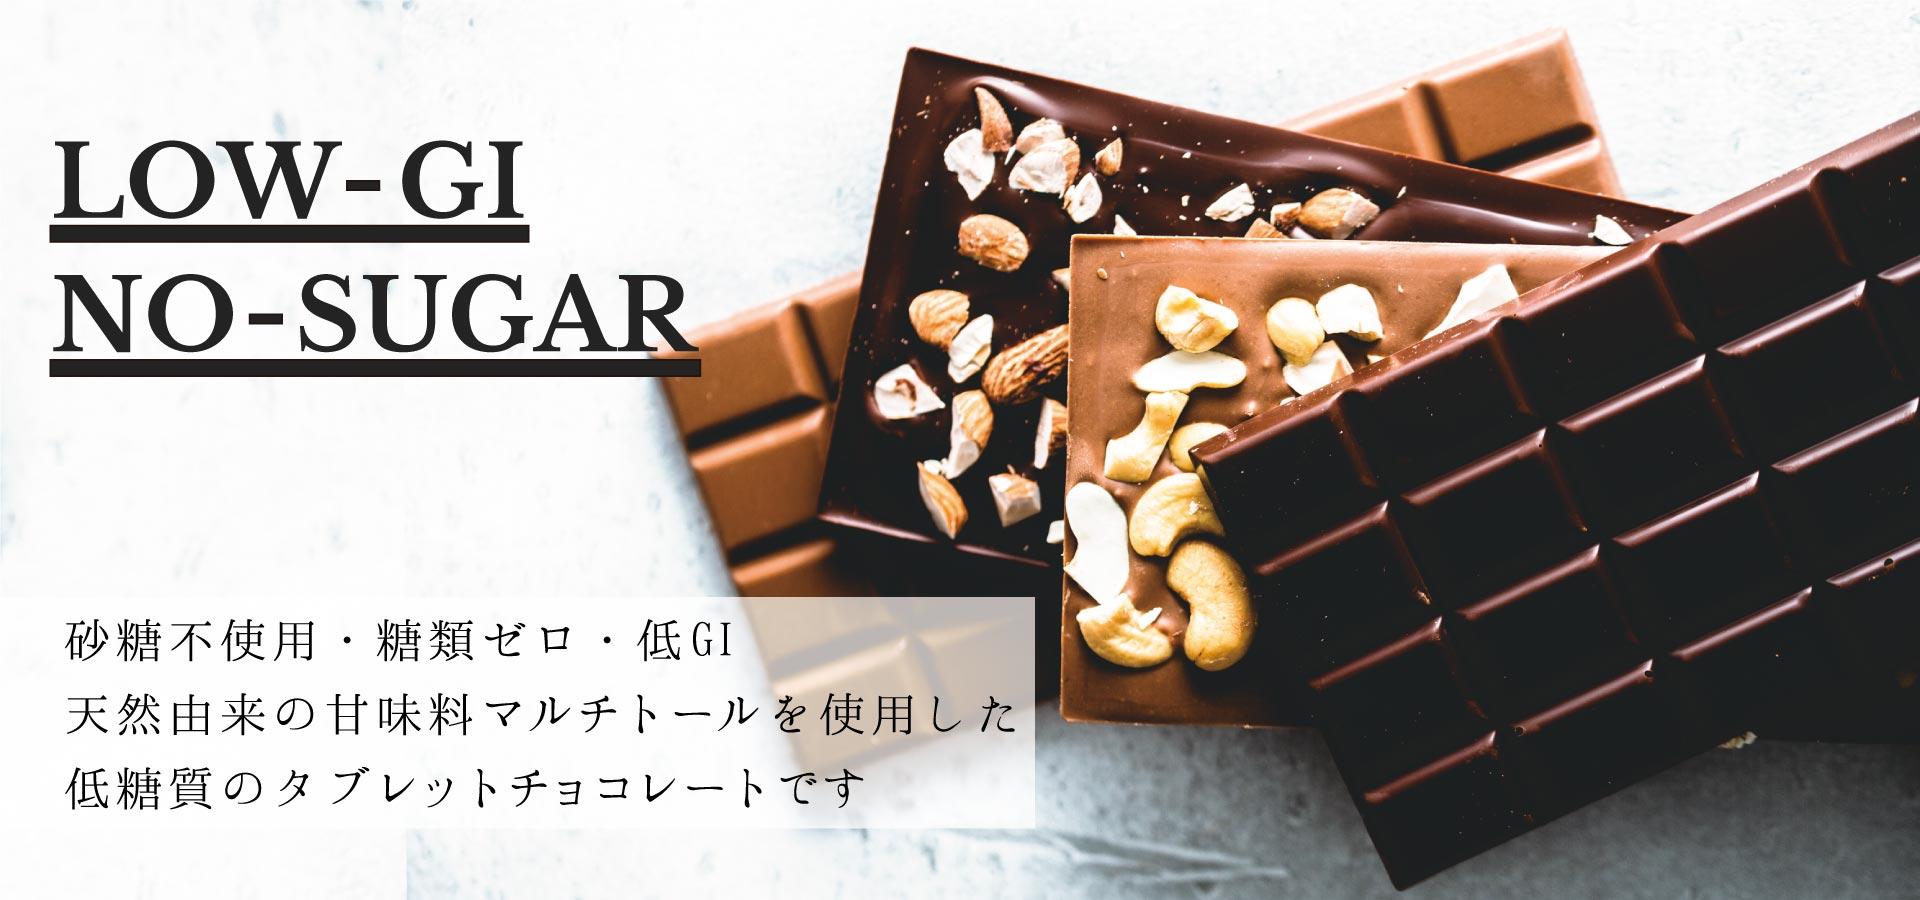 Bonbon Chocolat/ボンボンショコラ